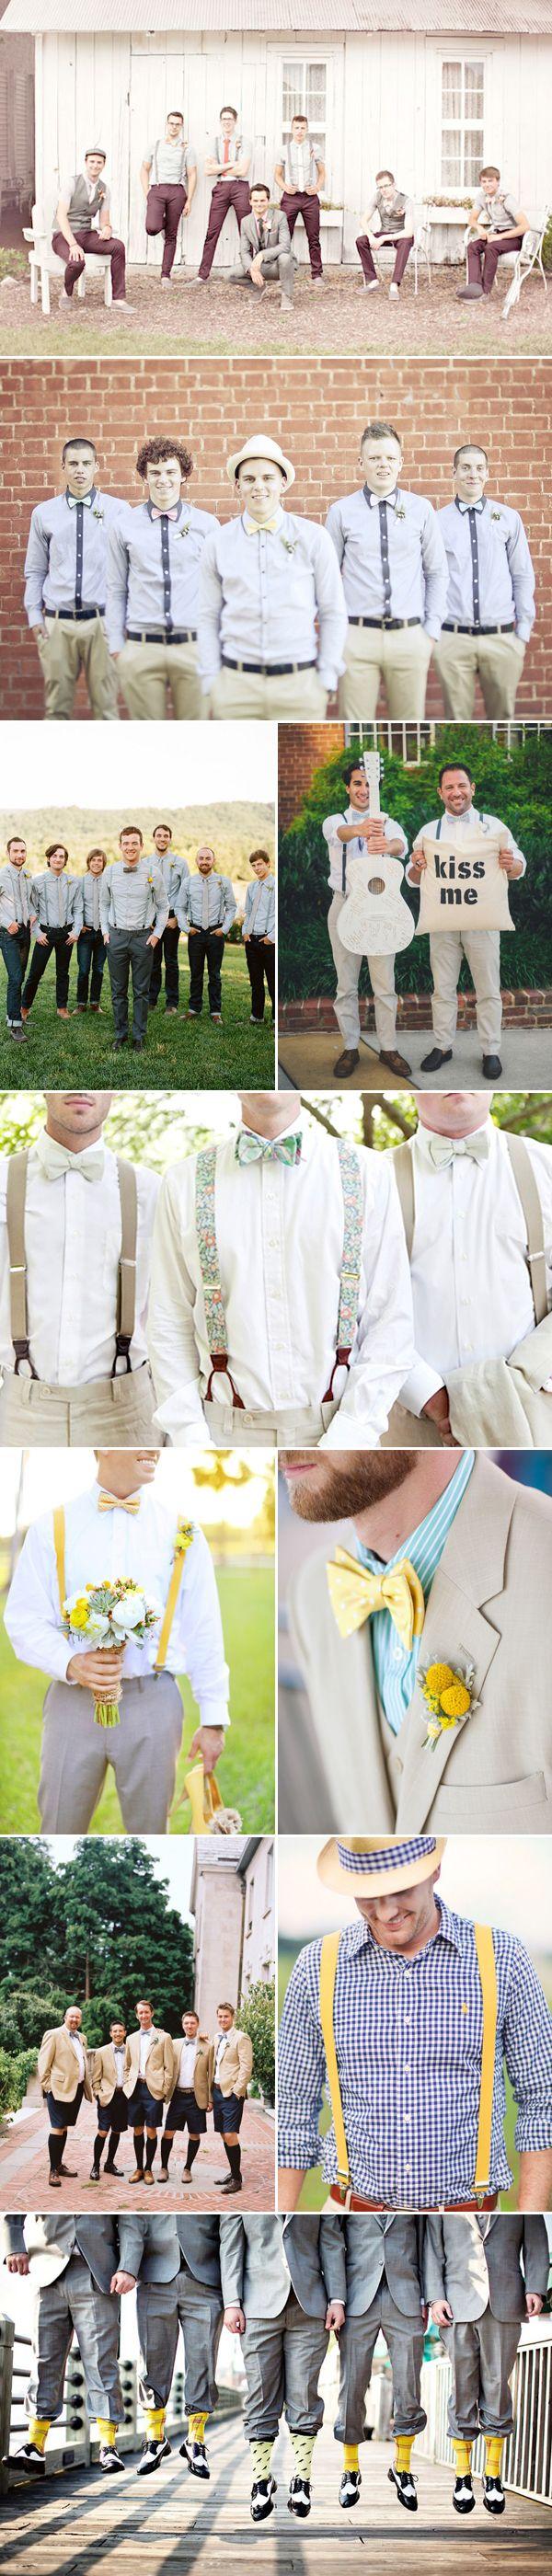 56 best Wedding ideas images on Pinterest   Wedding stuff, Groomsmen ...